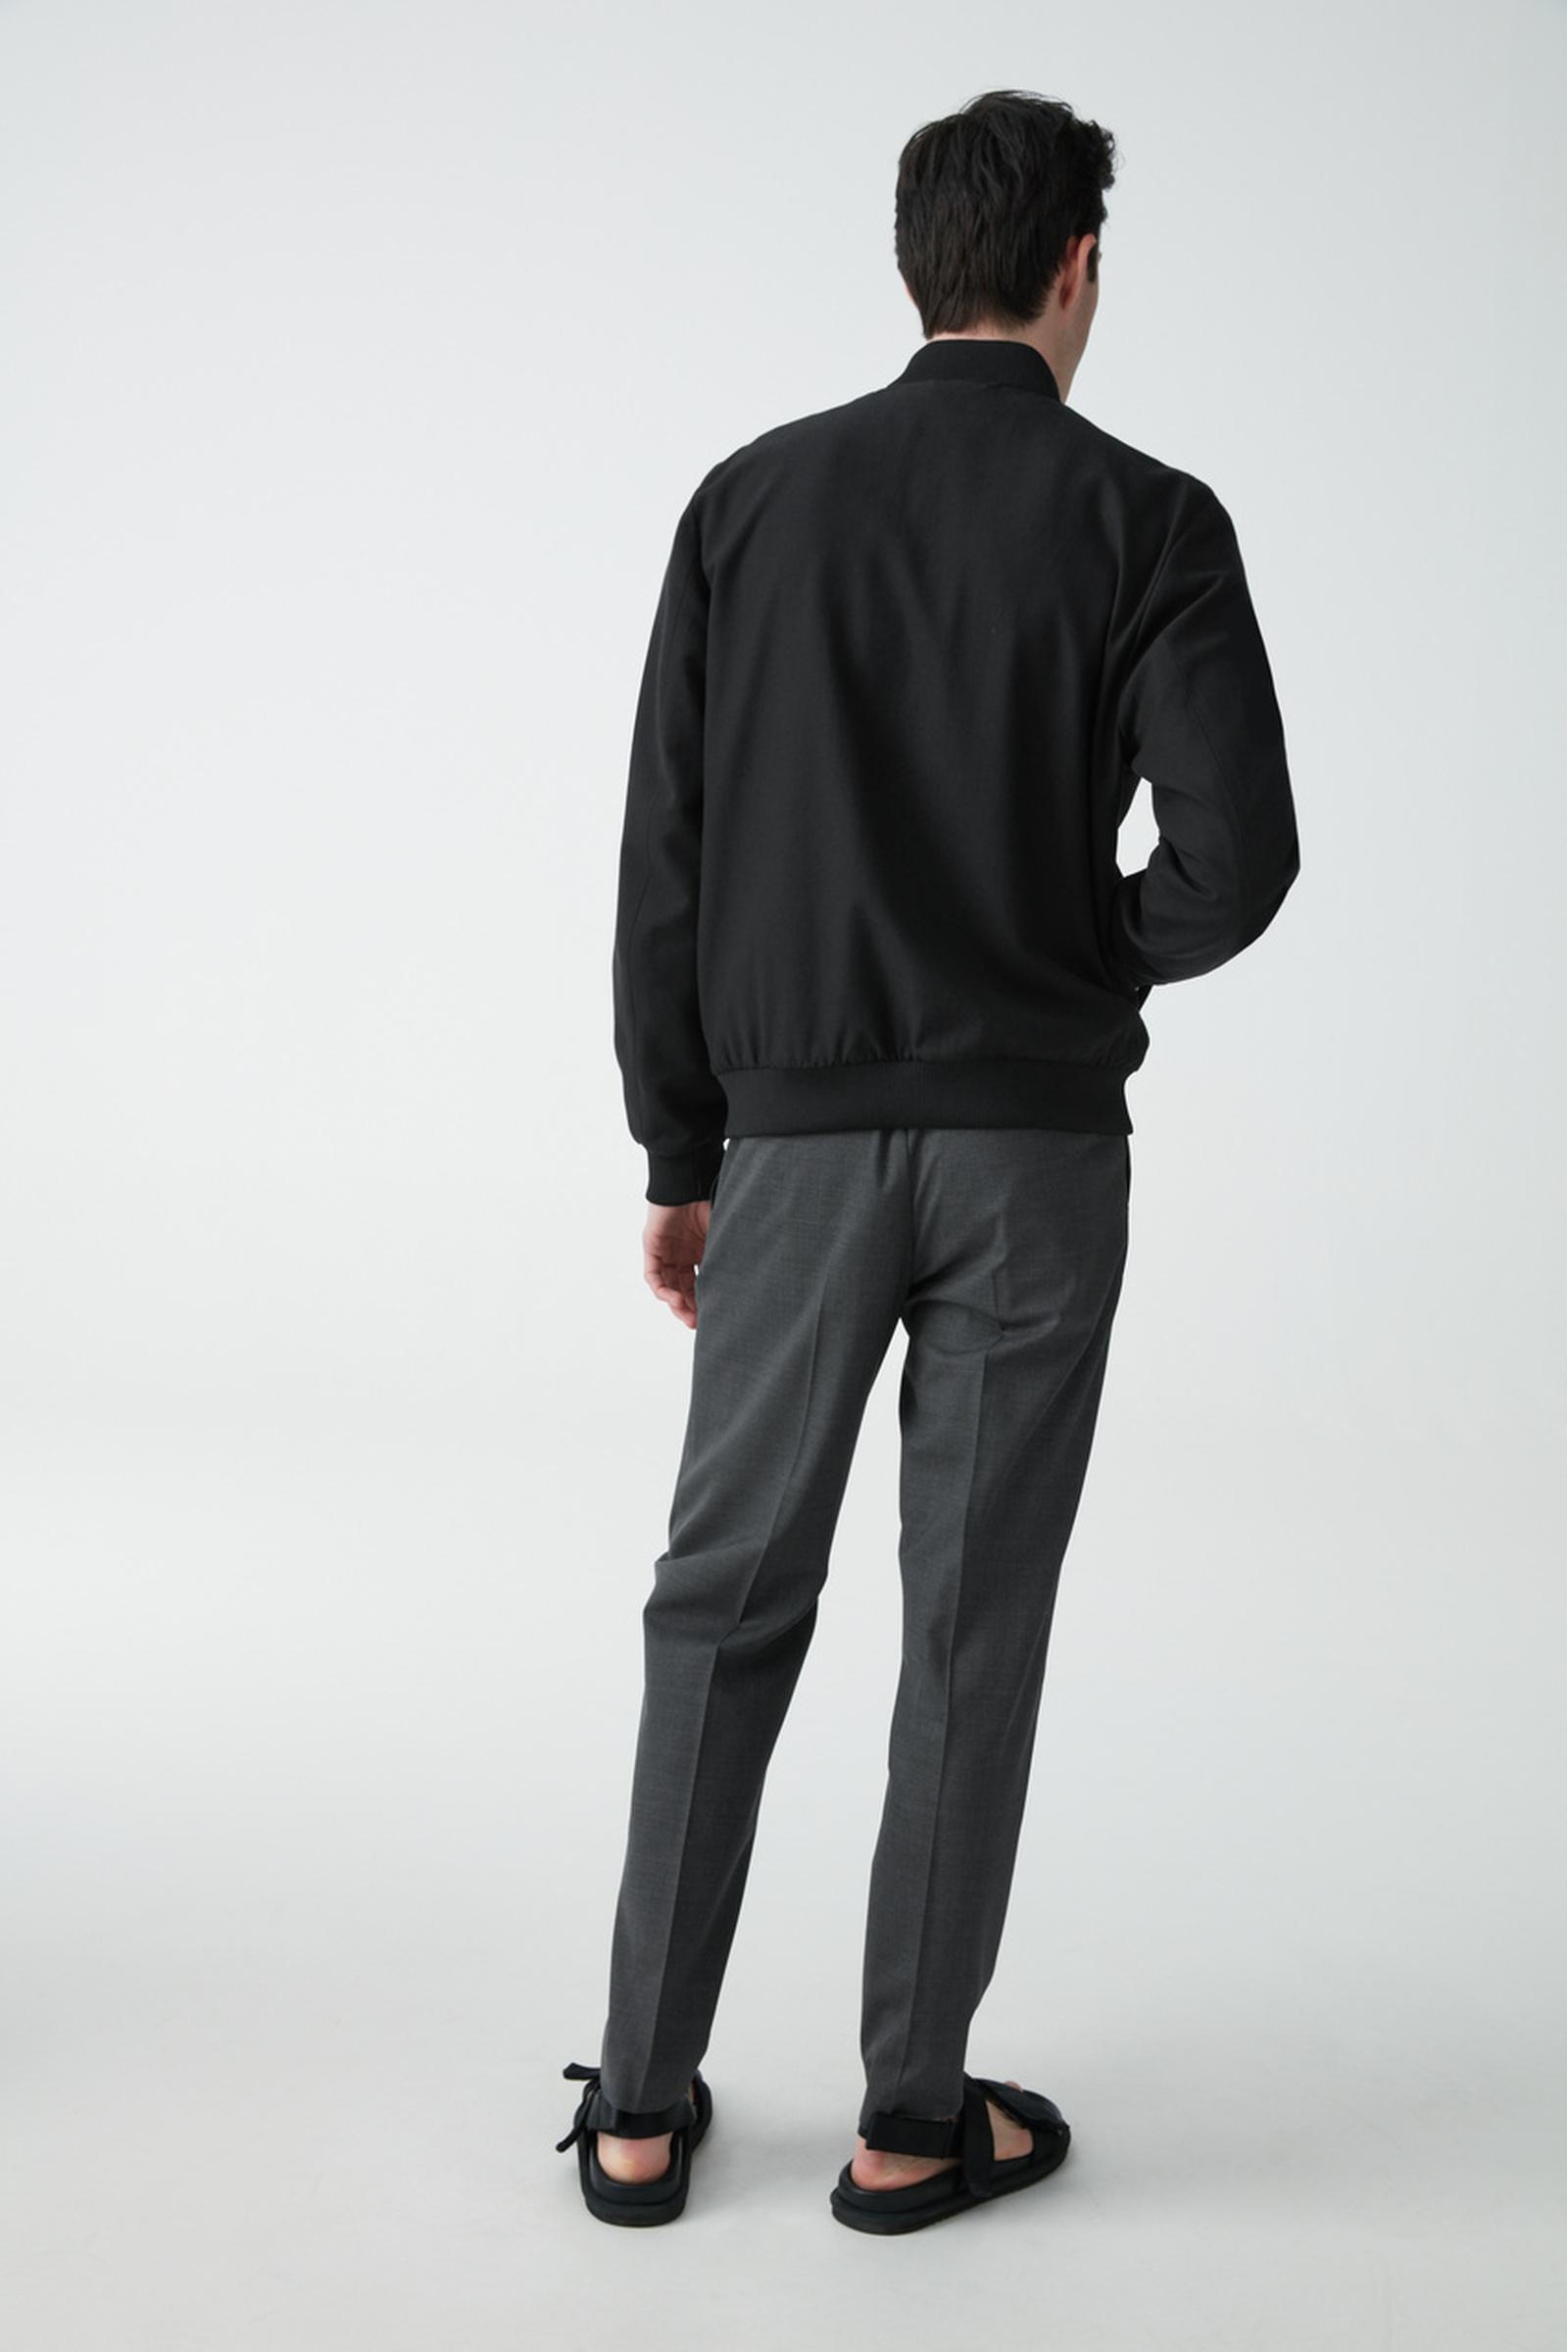 COS 코튼 봄버 재킷의 블랙컬러 ECOMLook입니다.